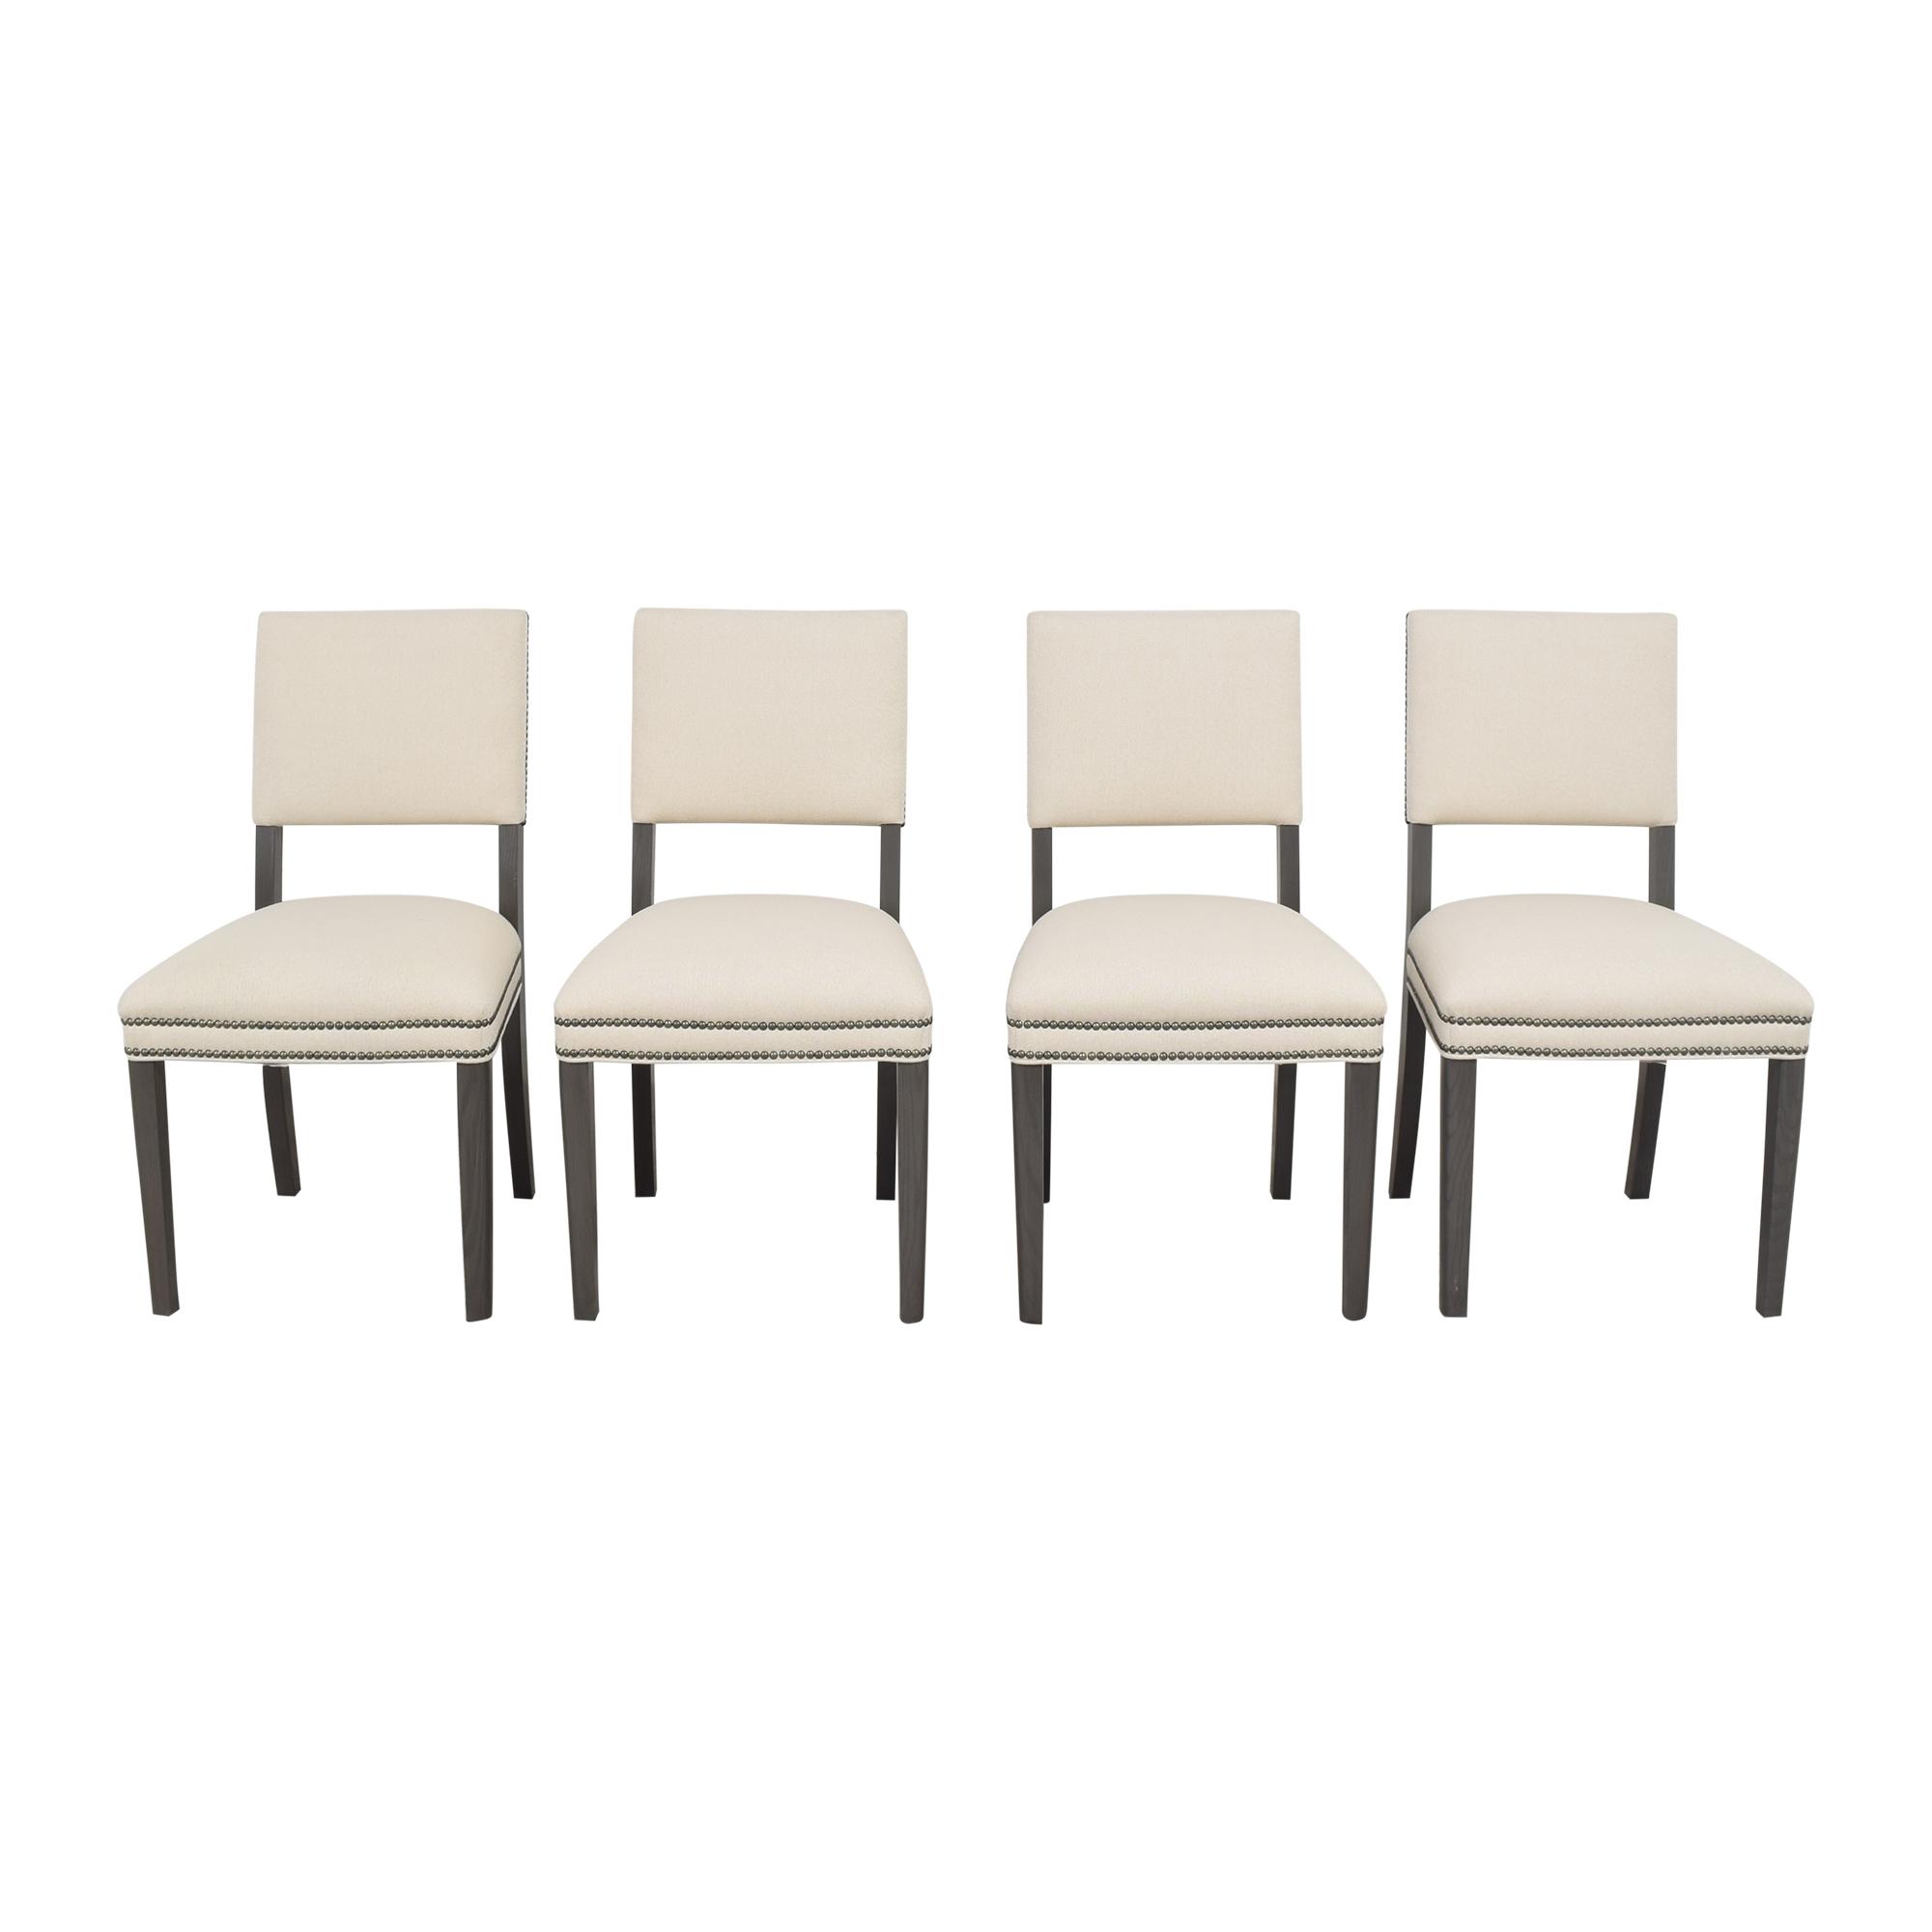 Vanguard Furniture Vanguard Furniture Newton Stocked Dining Chairs used